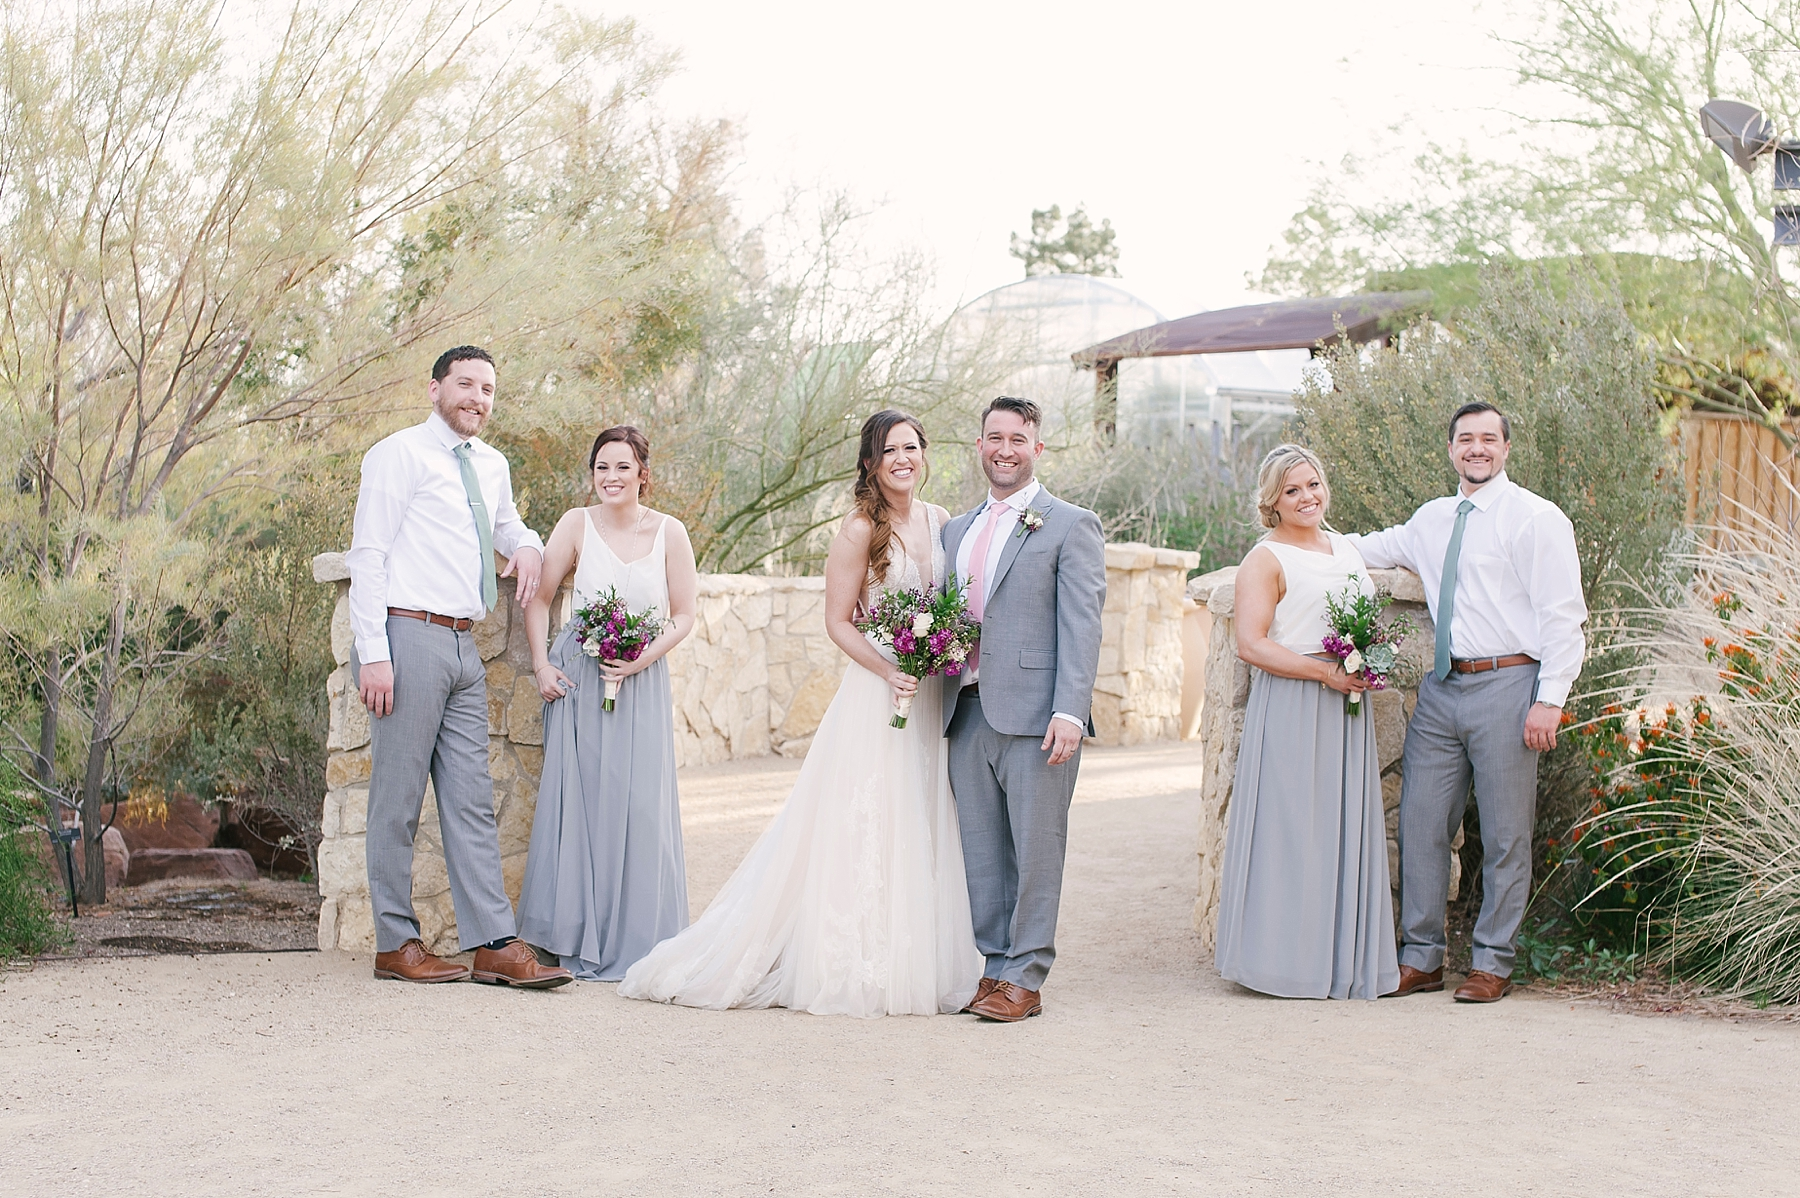 springs-preserve-wedding-las-vegas-destination-photography-the-emerics-30.jpg